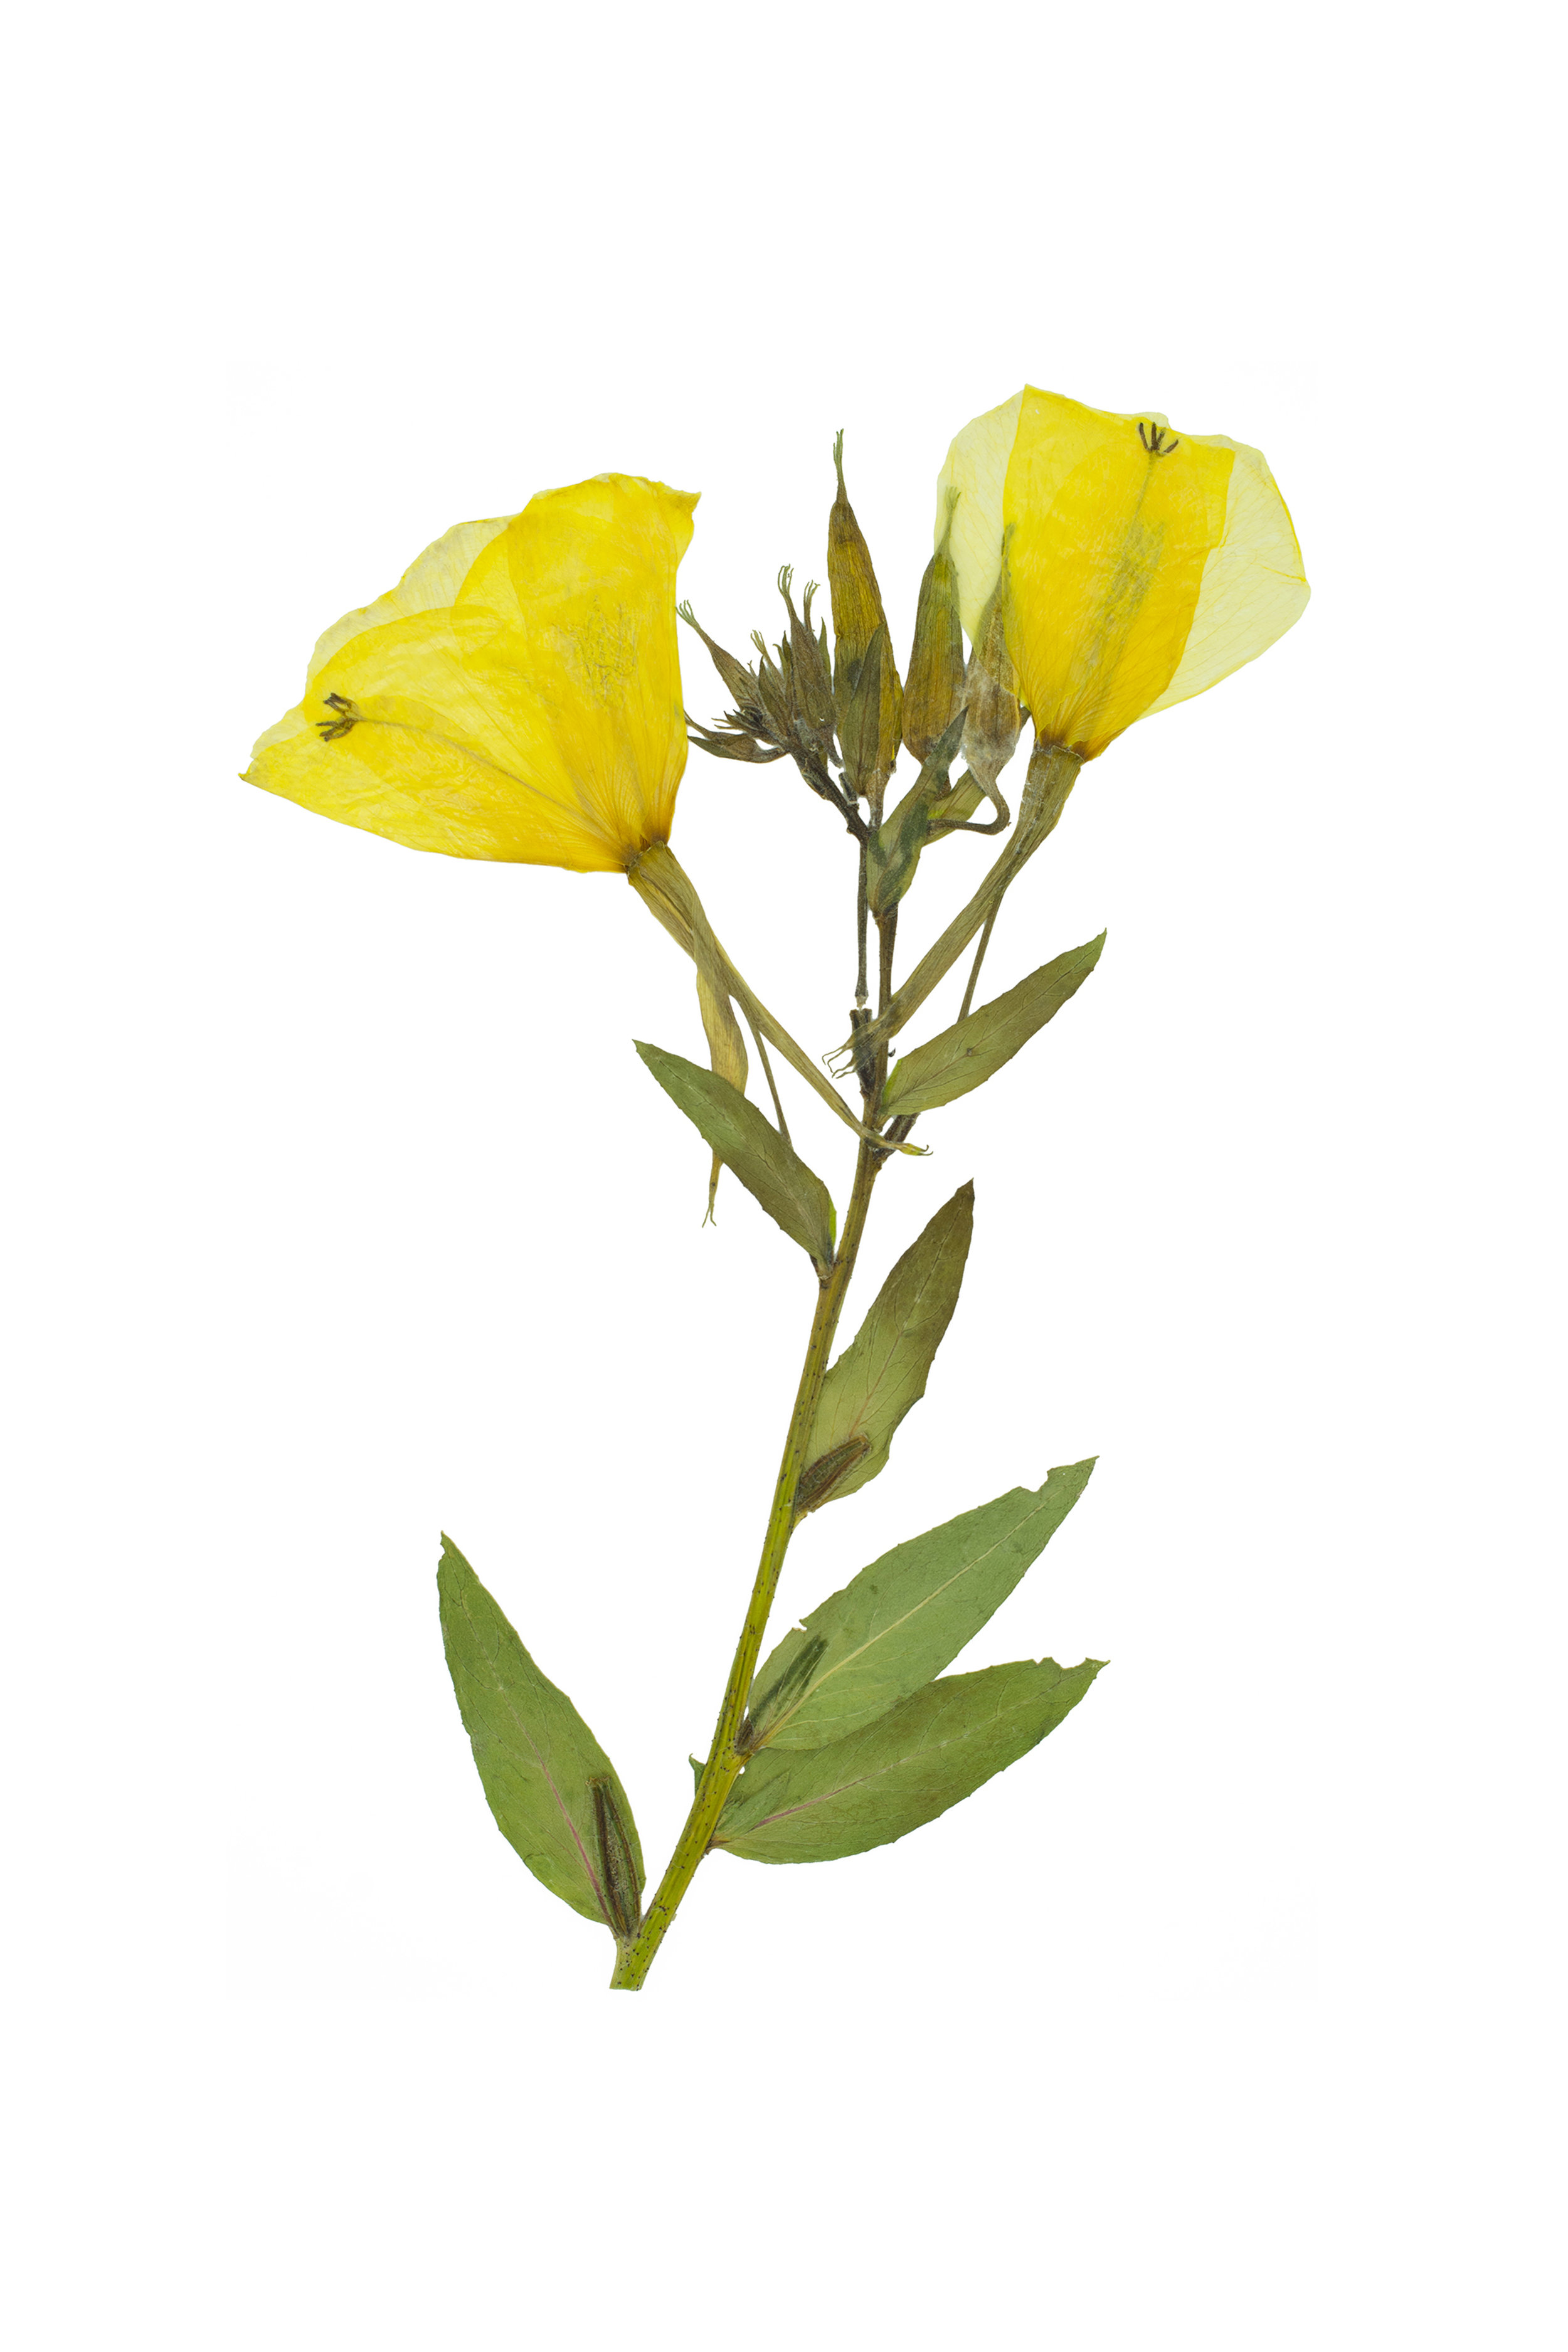 Large-Flowered Evening Primrose / Oenothera glazioviana